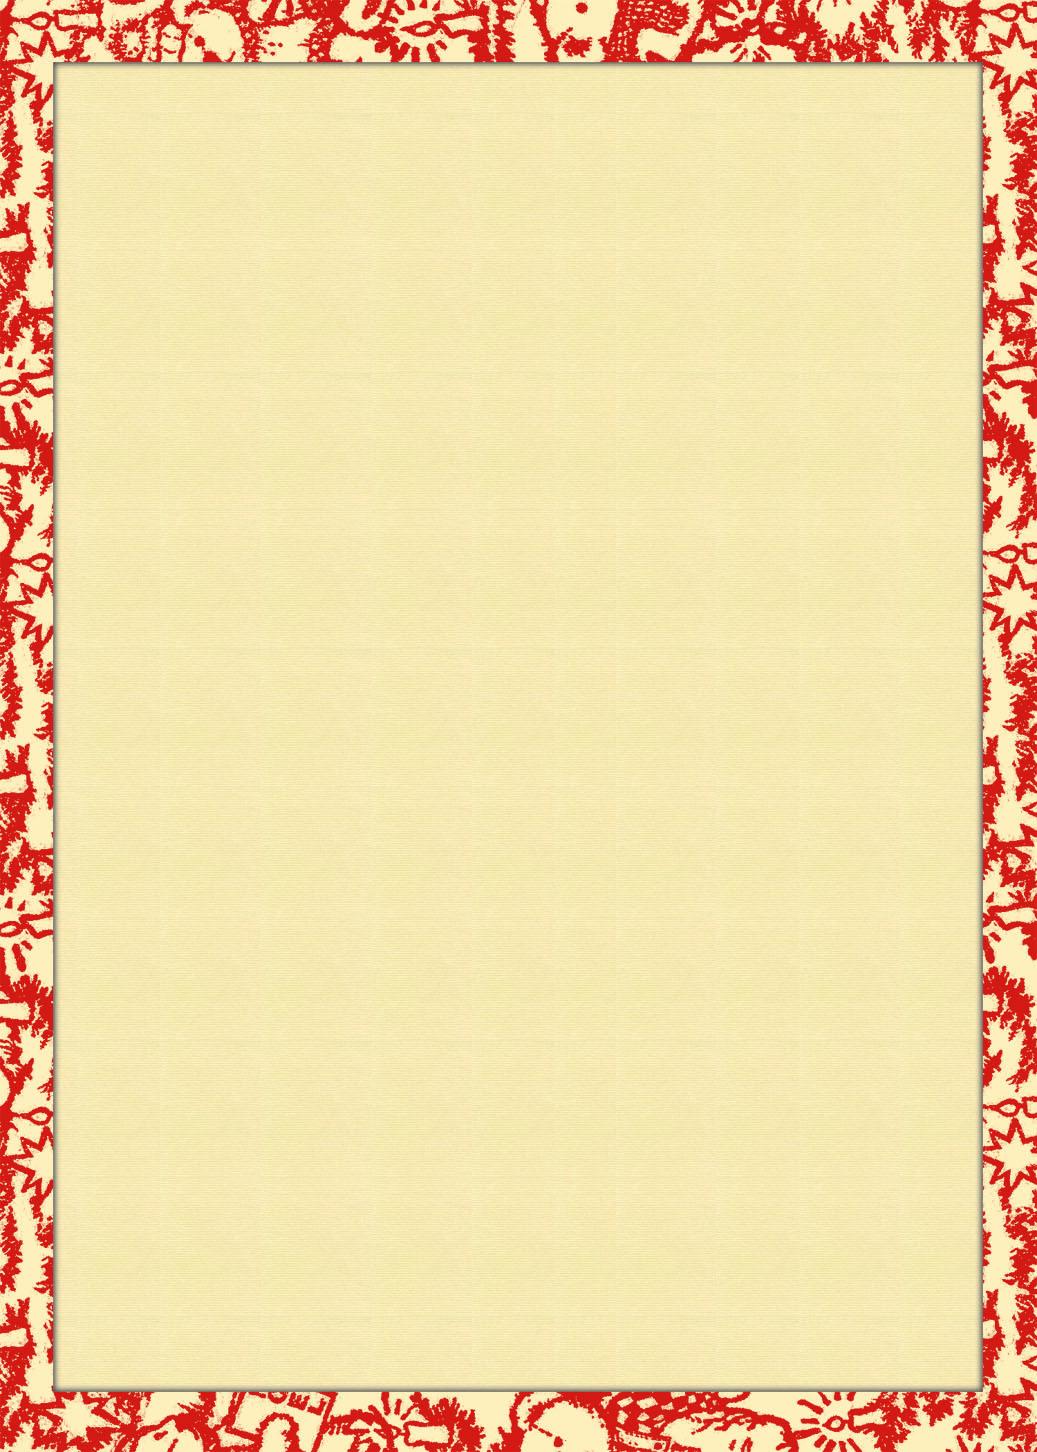 Free Christmas Letterhead, Free Printable Christmas Letterhead Templates - Free Printable Christmas Letterhead